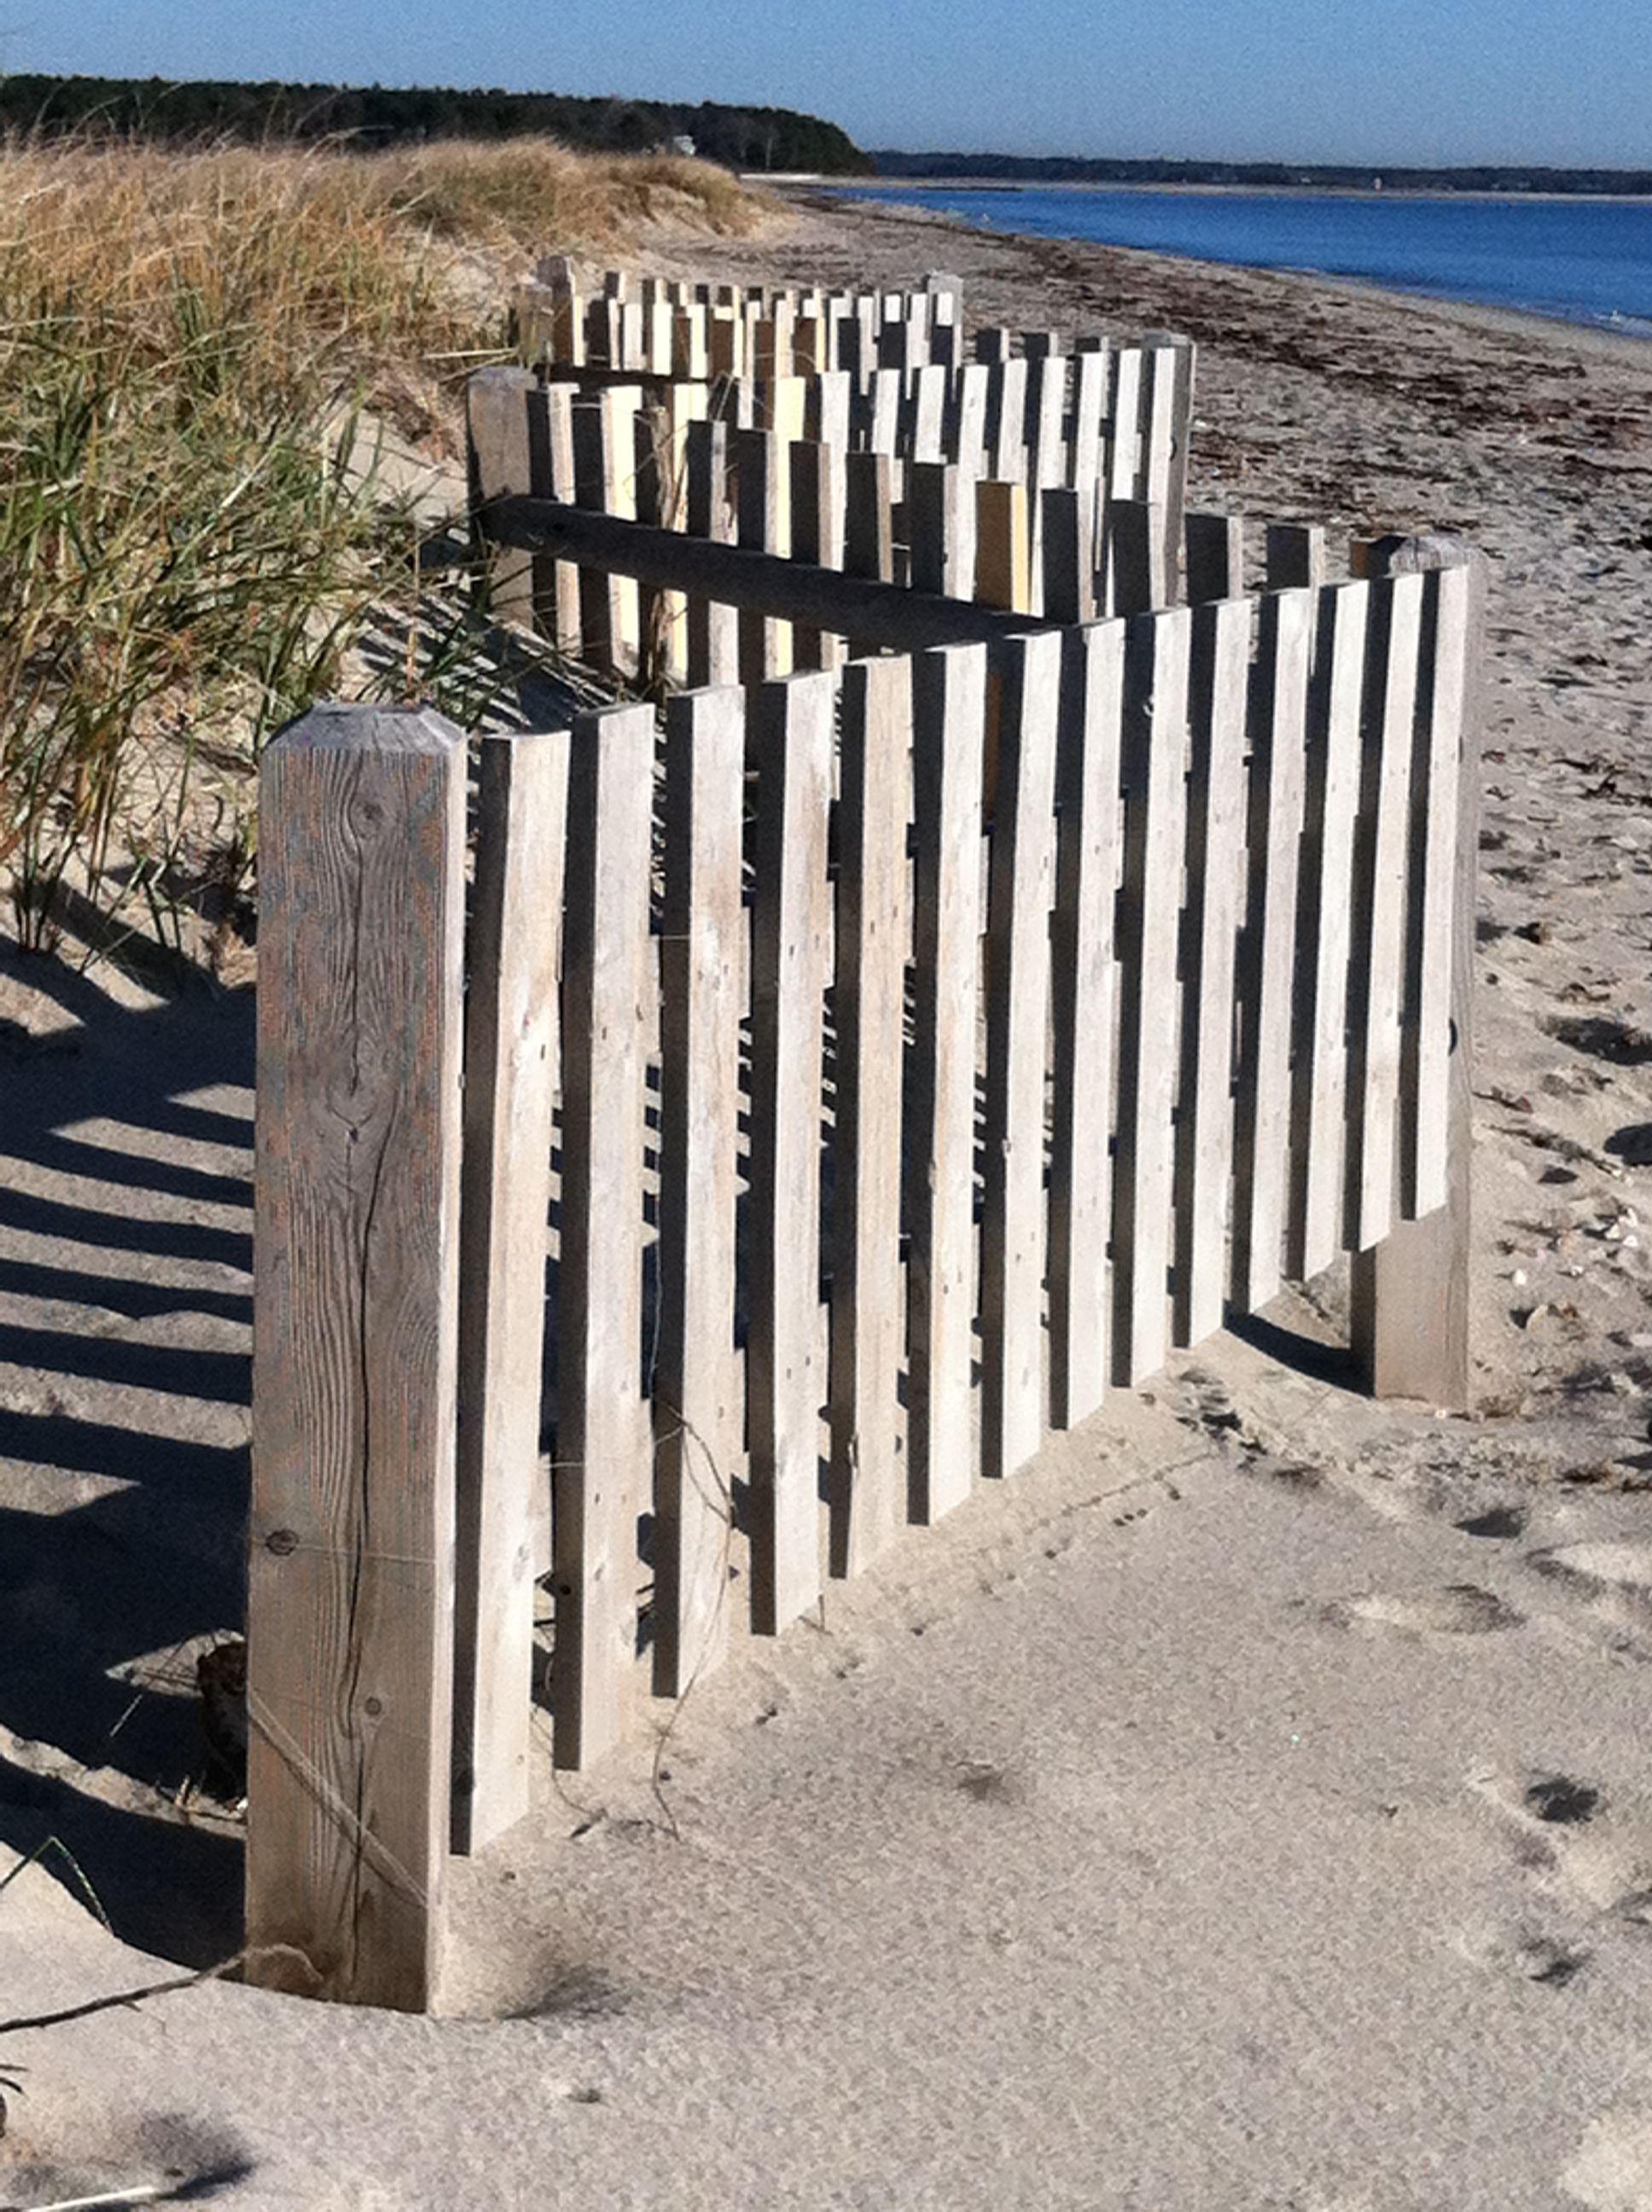 beach fences IPhone graphy Pinterest